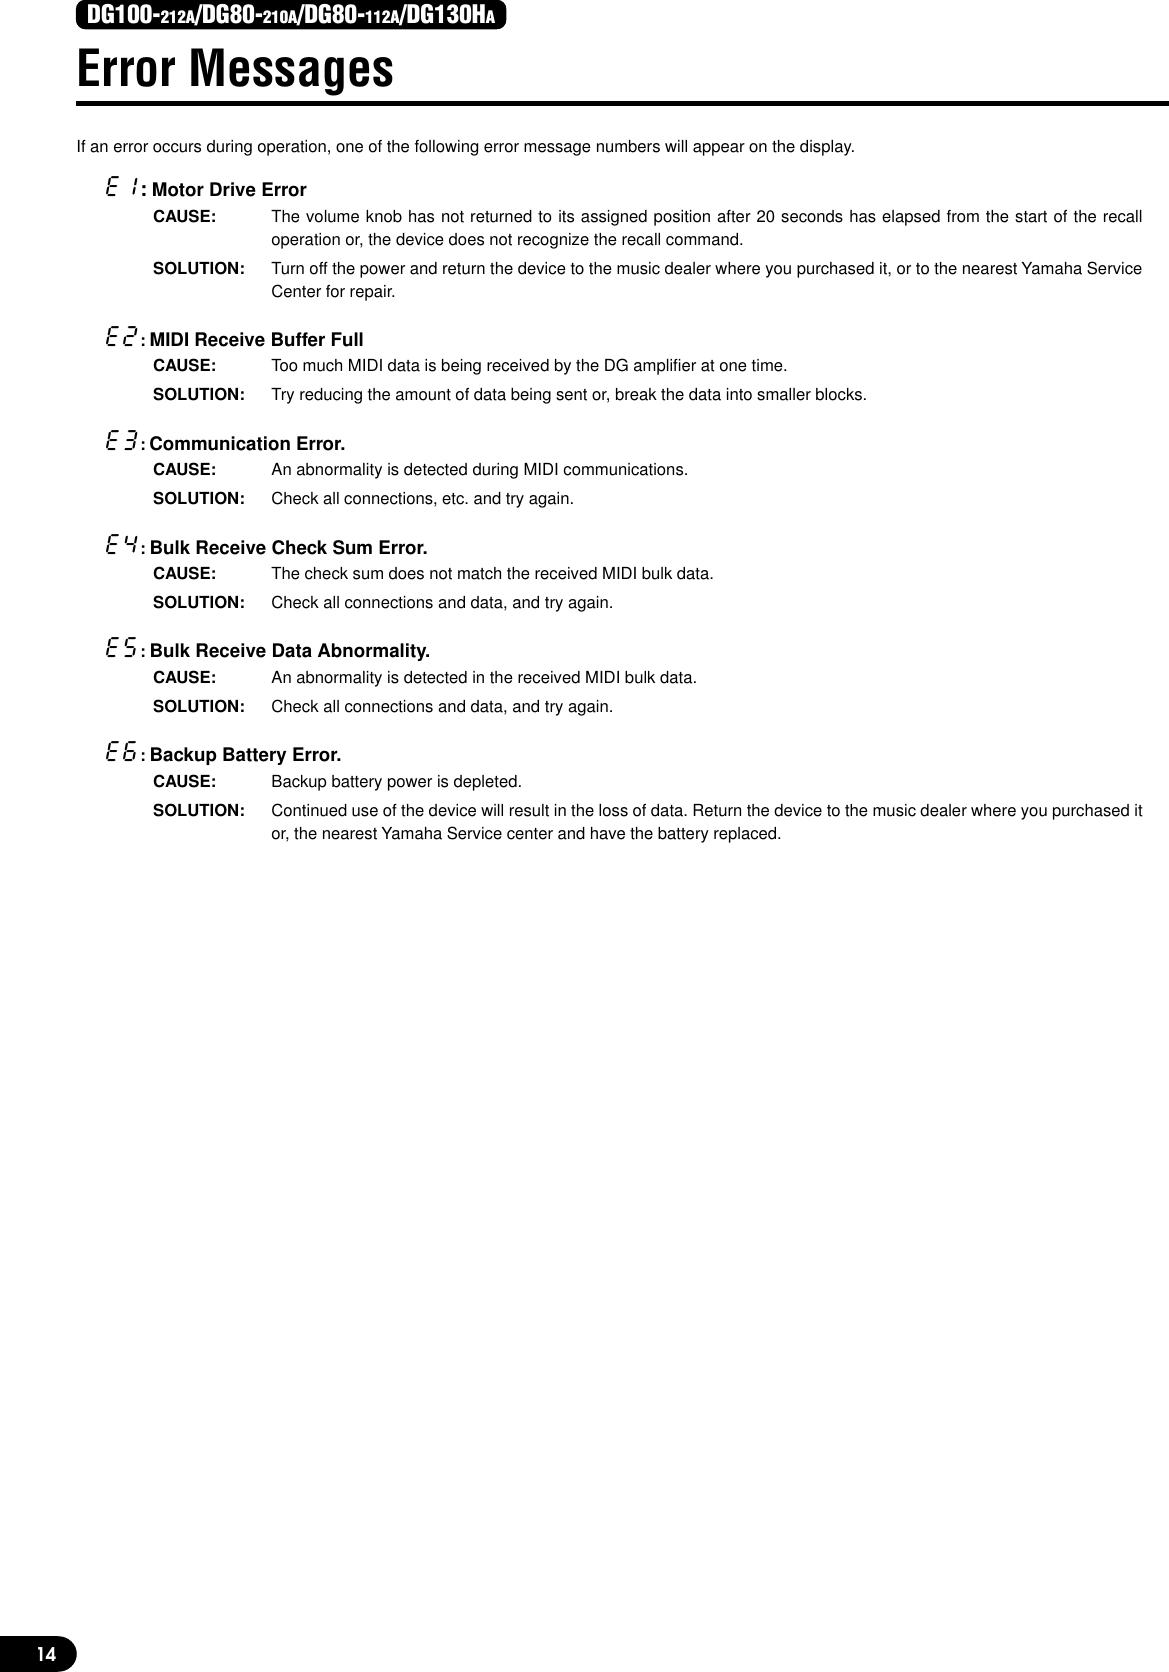 Yamaha DG130H Owner's Manual 1